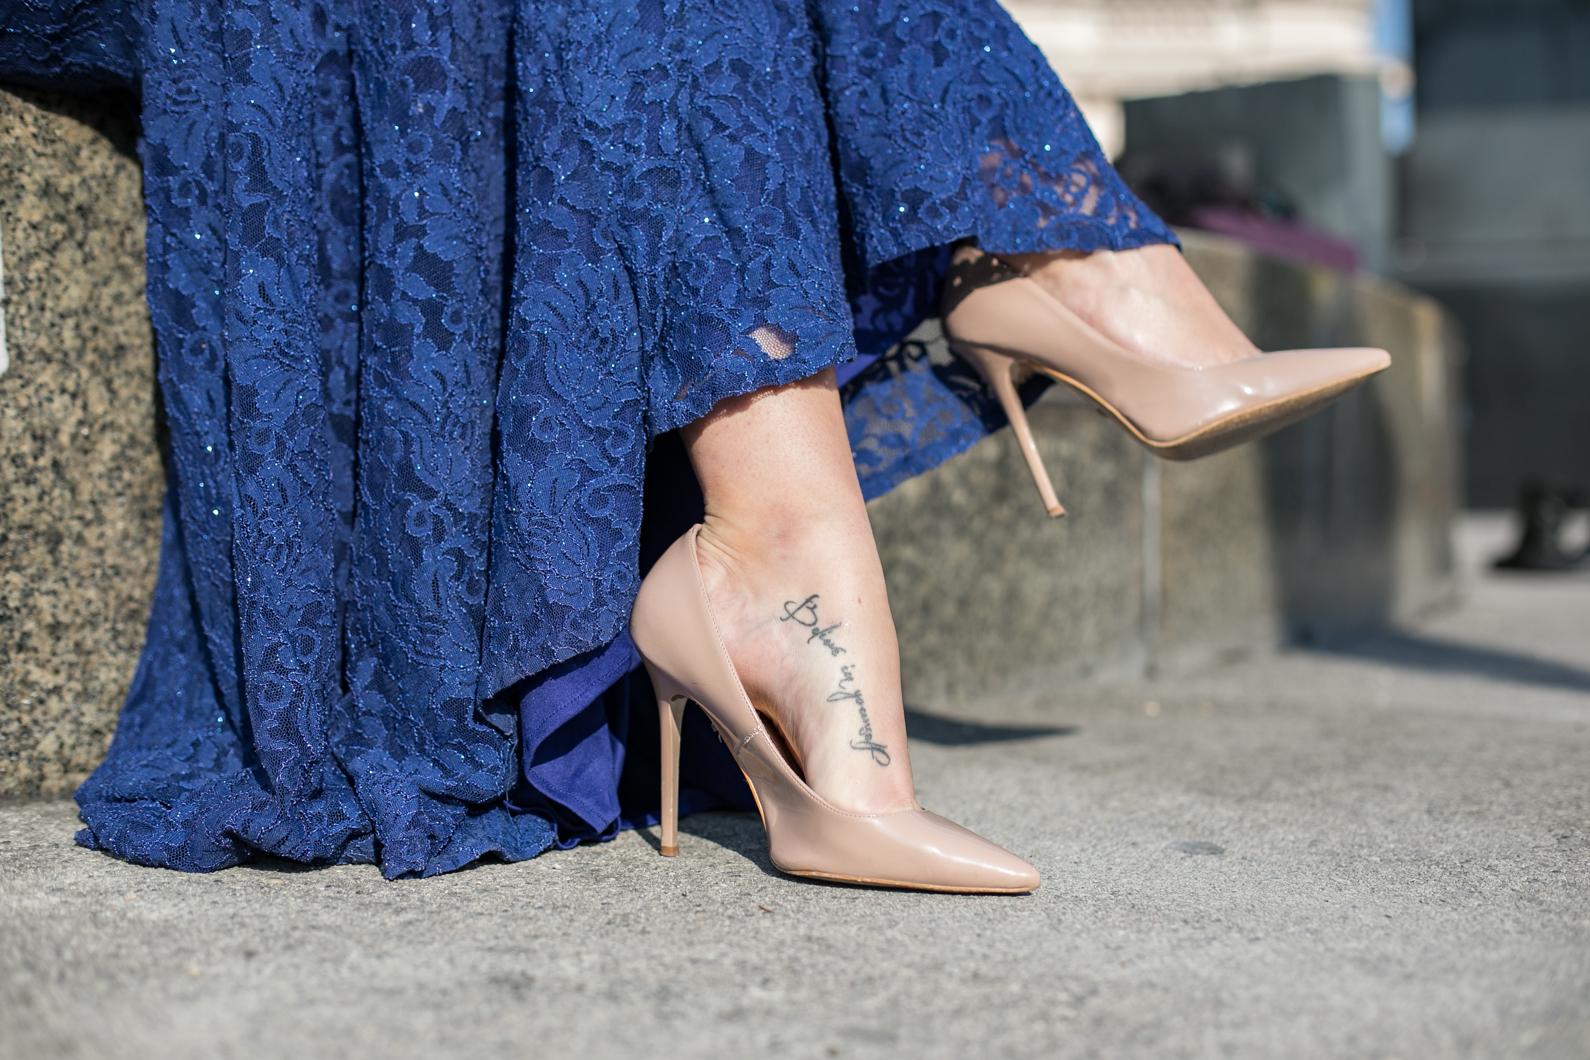 1600-Nadja-Nemetz-NadjaNemetz-Violetfleur-Violet-Fleur-Blog-Wien-WienerBlog-Beauty-Fashion-Lifestyle-Modeblog-Beautyblog-Fotografin-Bloggerin-helenadia-helena-dia-earrings-ohrringe-tkmaxx-ballsaison-10